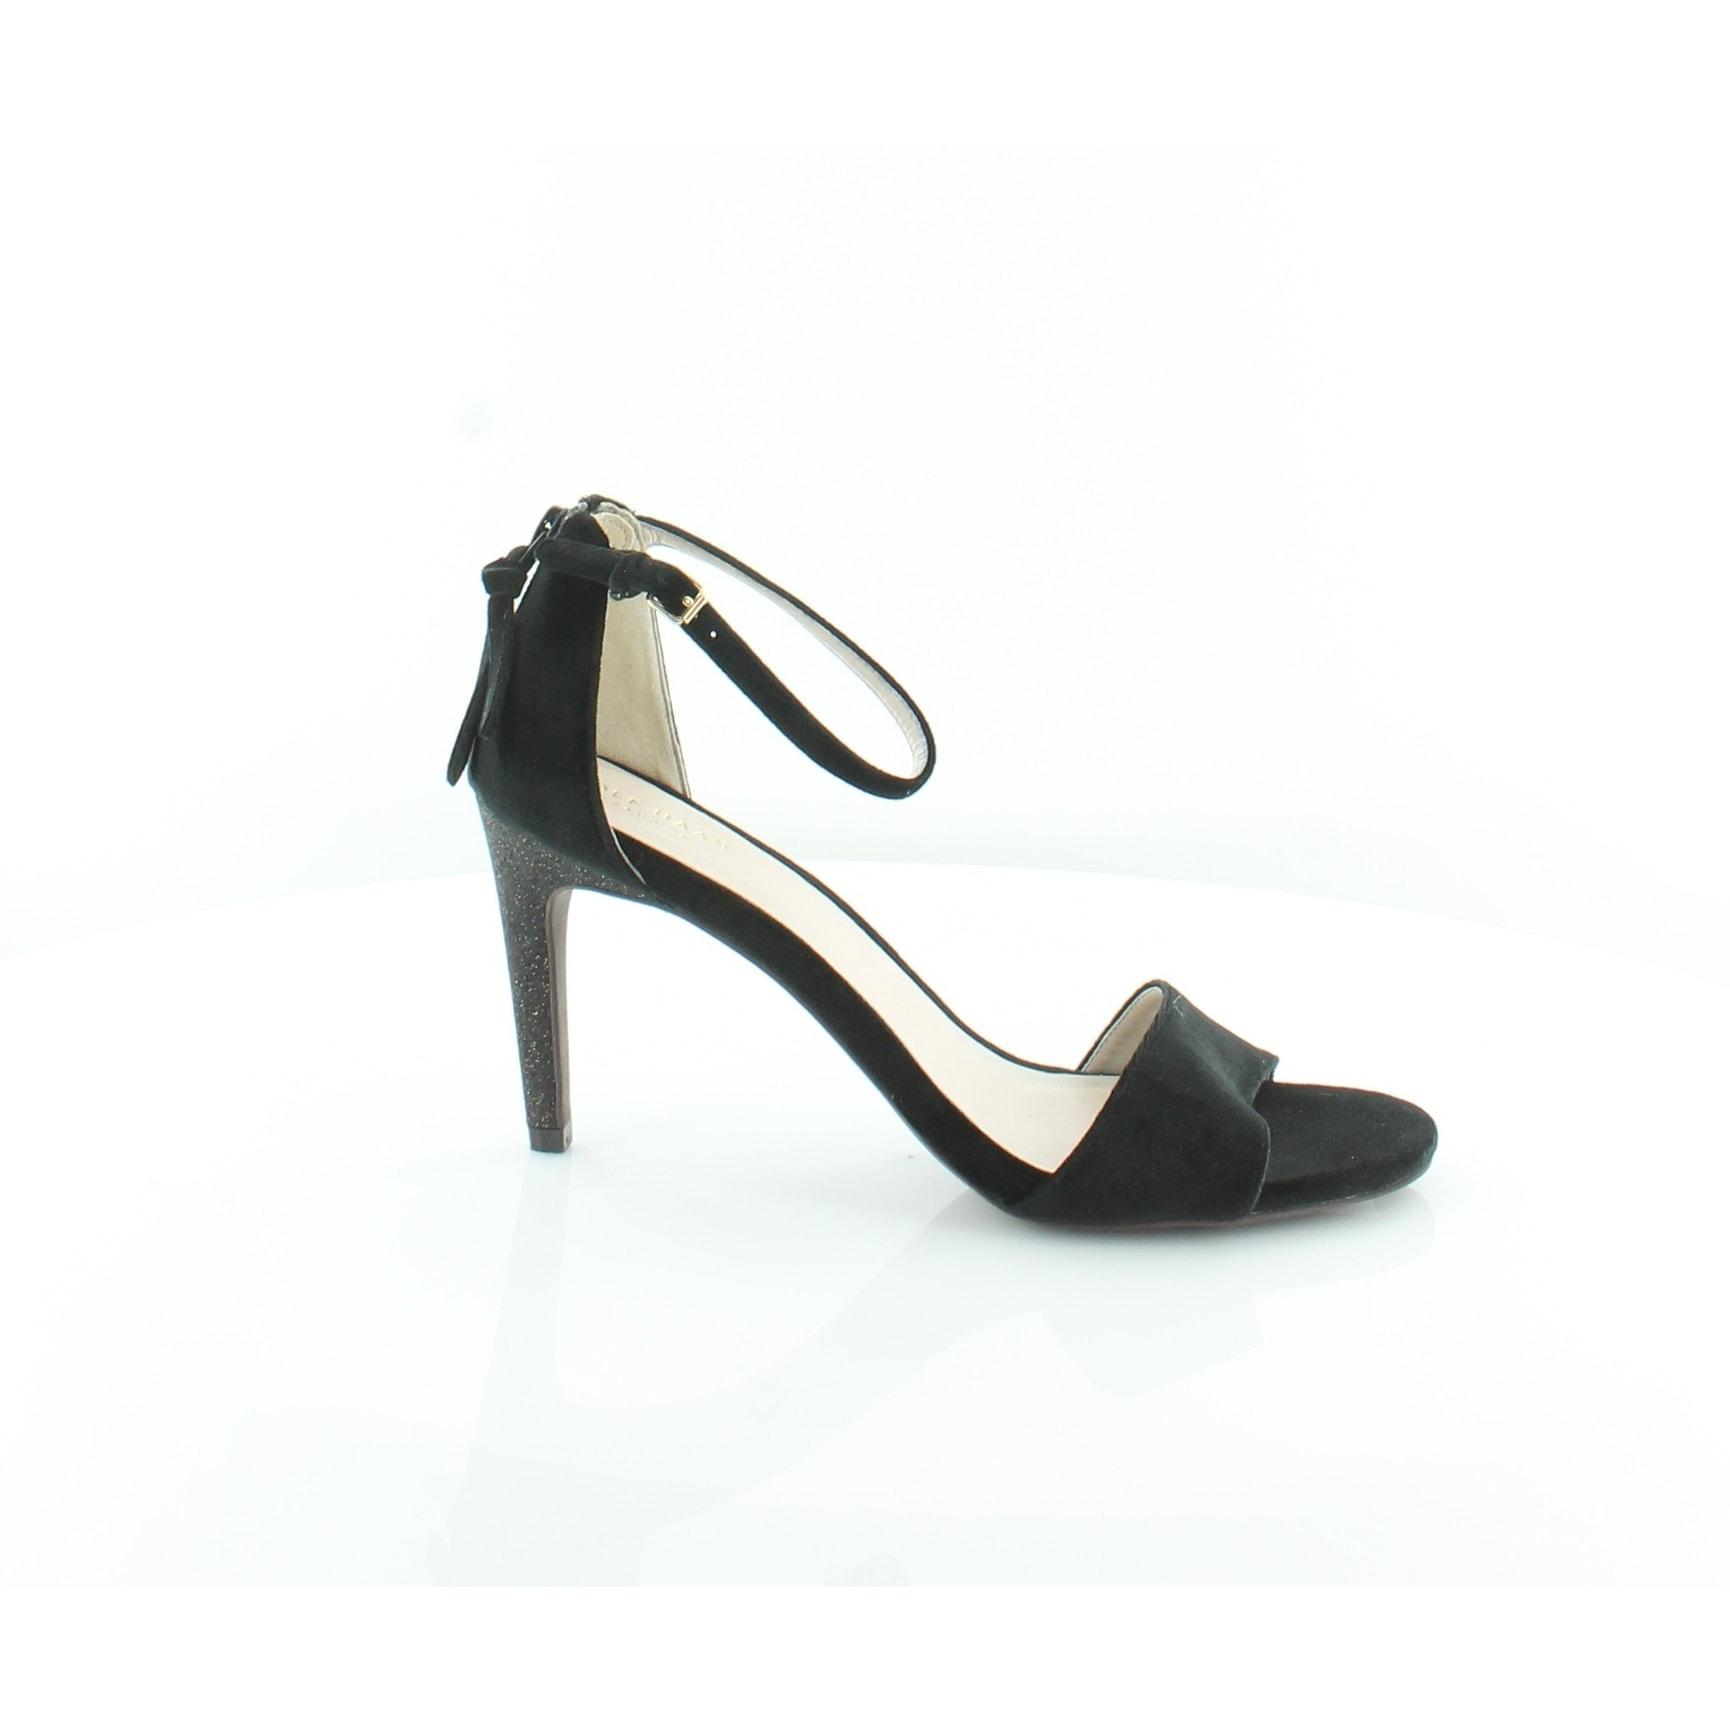 4f861f3a6d7 Buy Cole Haan Women s Sandals Online at Overstock